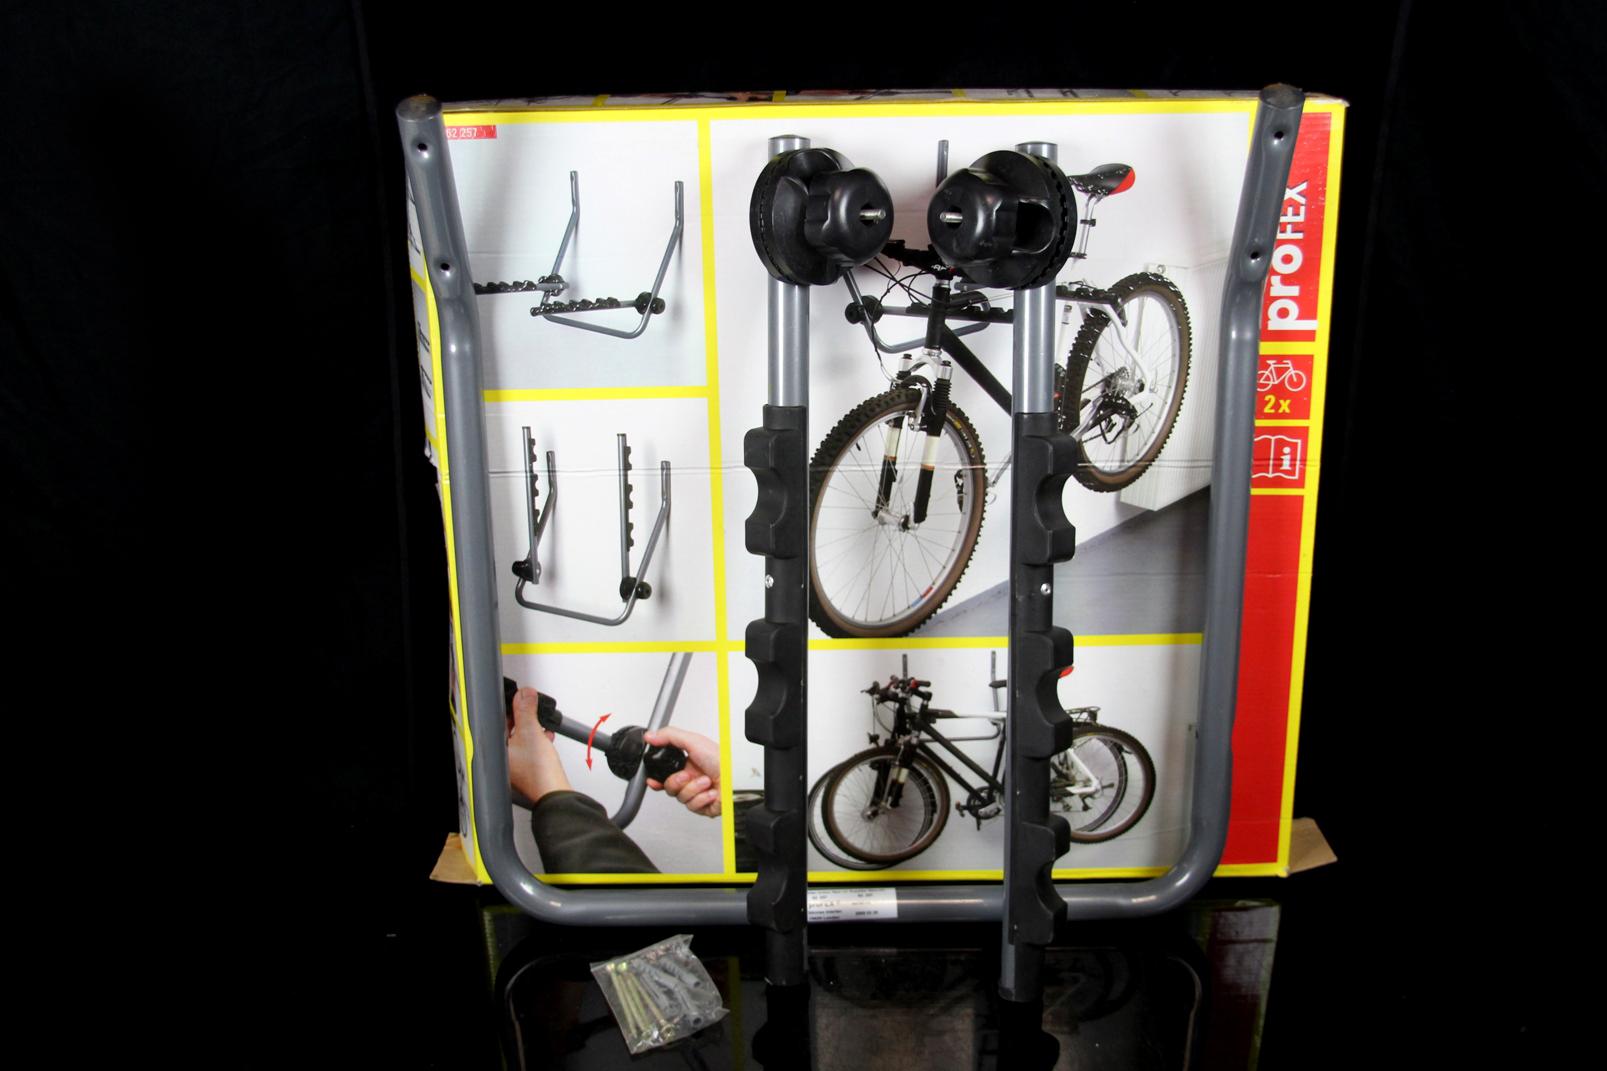 Fahrrad wandhalter profex fahrradaufh ngung f 2 fahrr der - Fahrradaufhangung wand ...